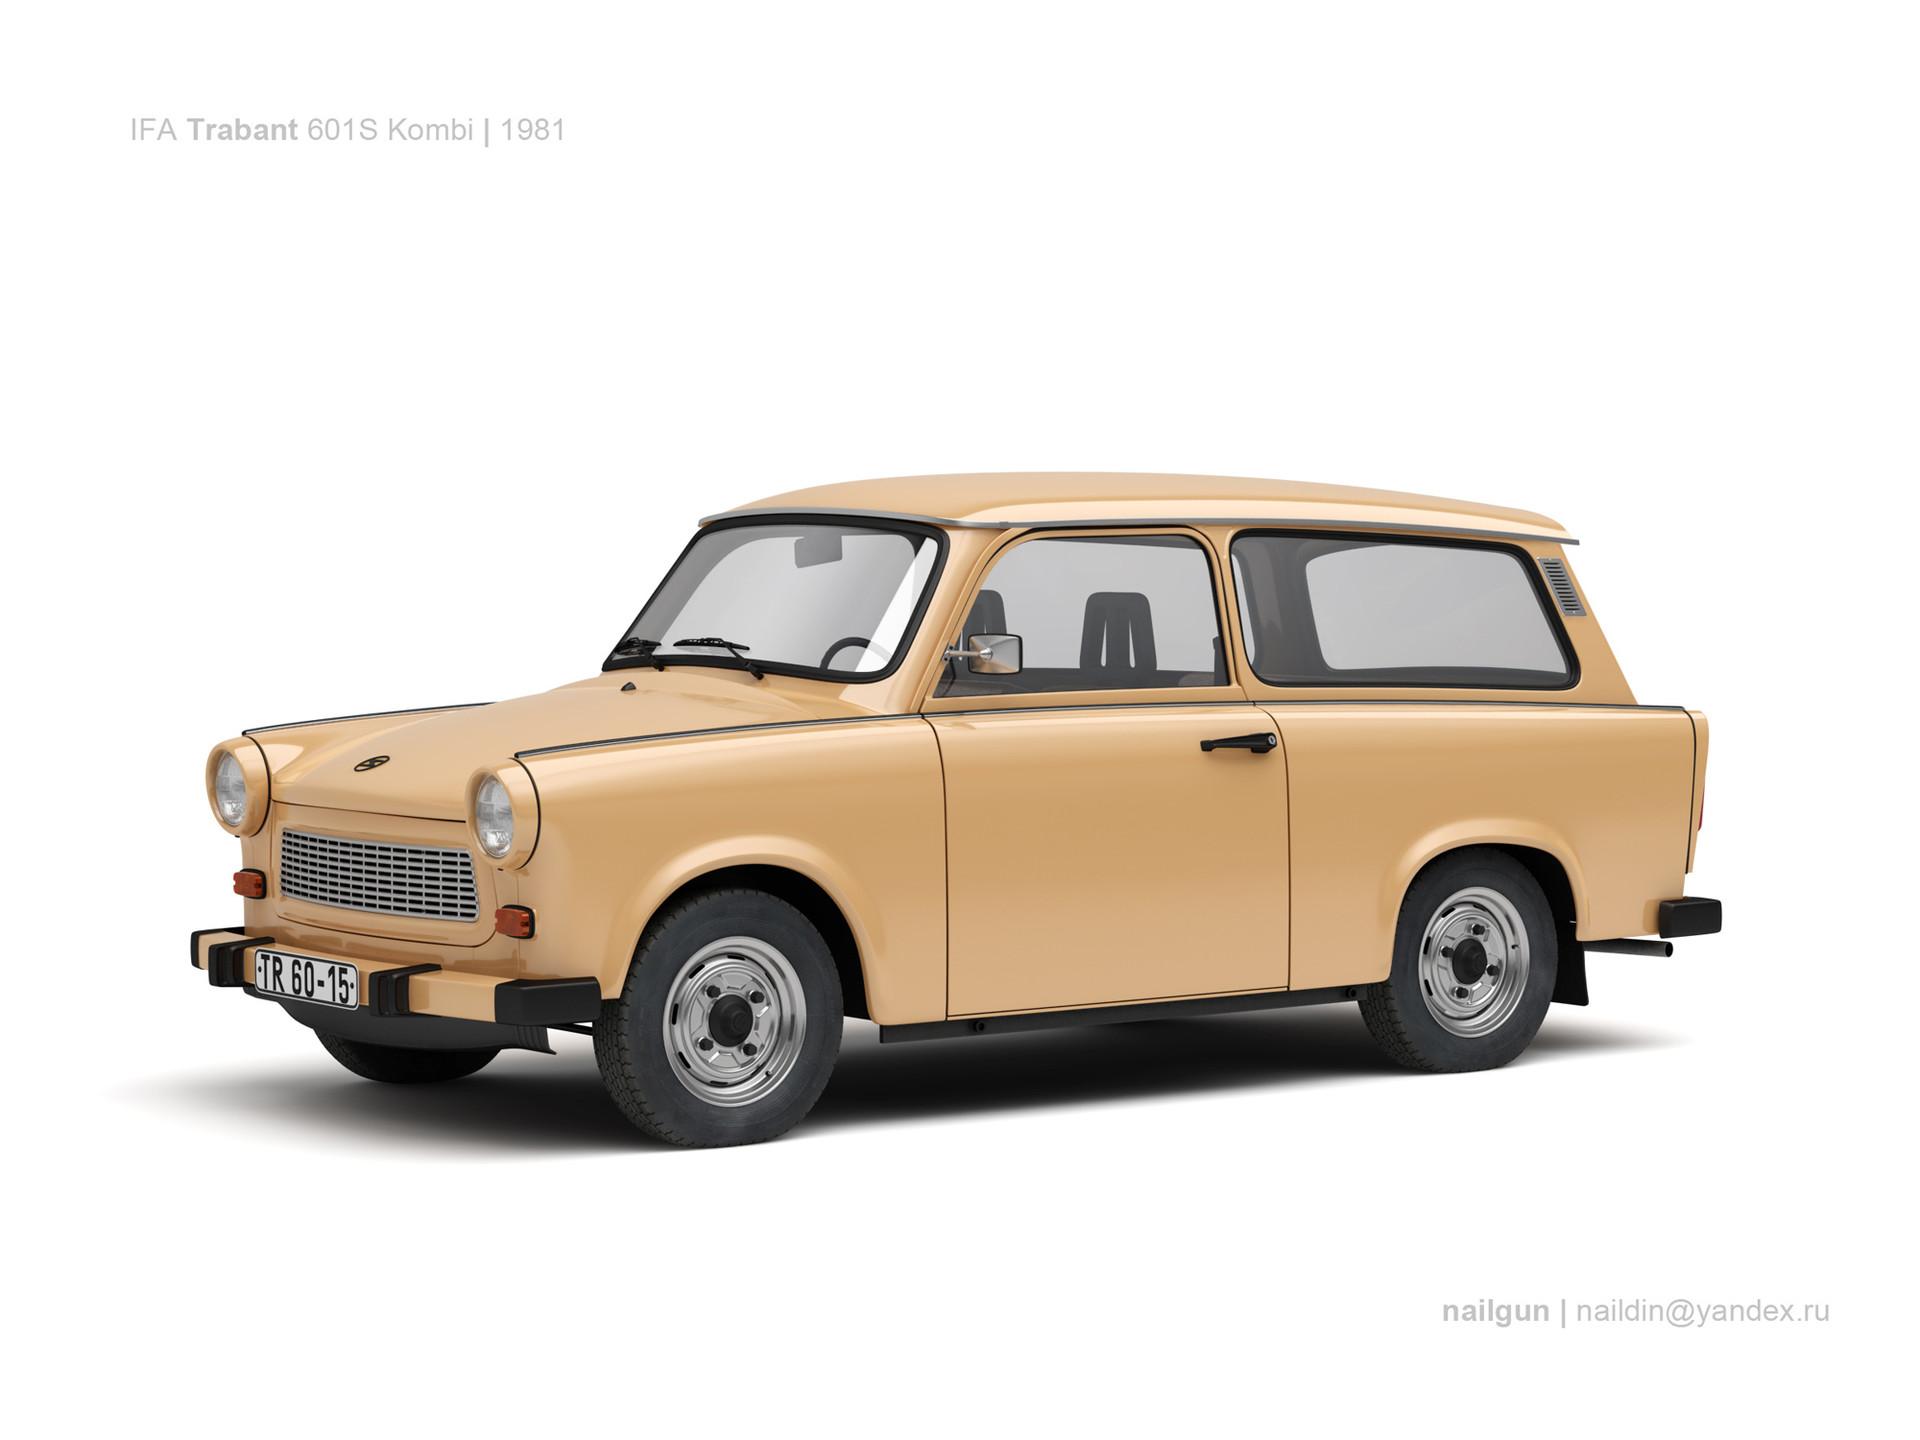 Nail khusnutdinov sw trabant 601s kombi 0